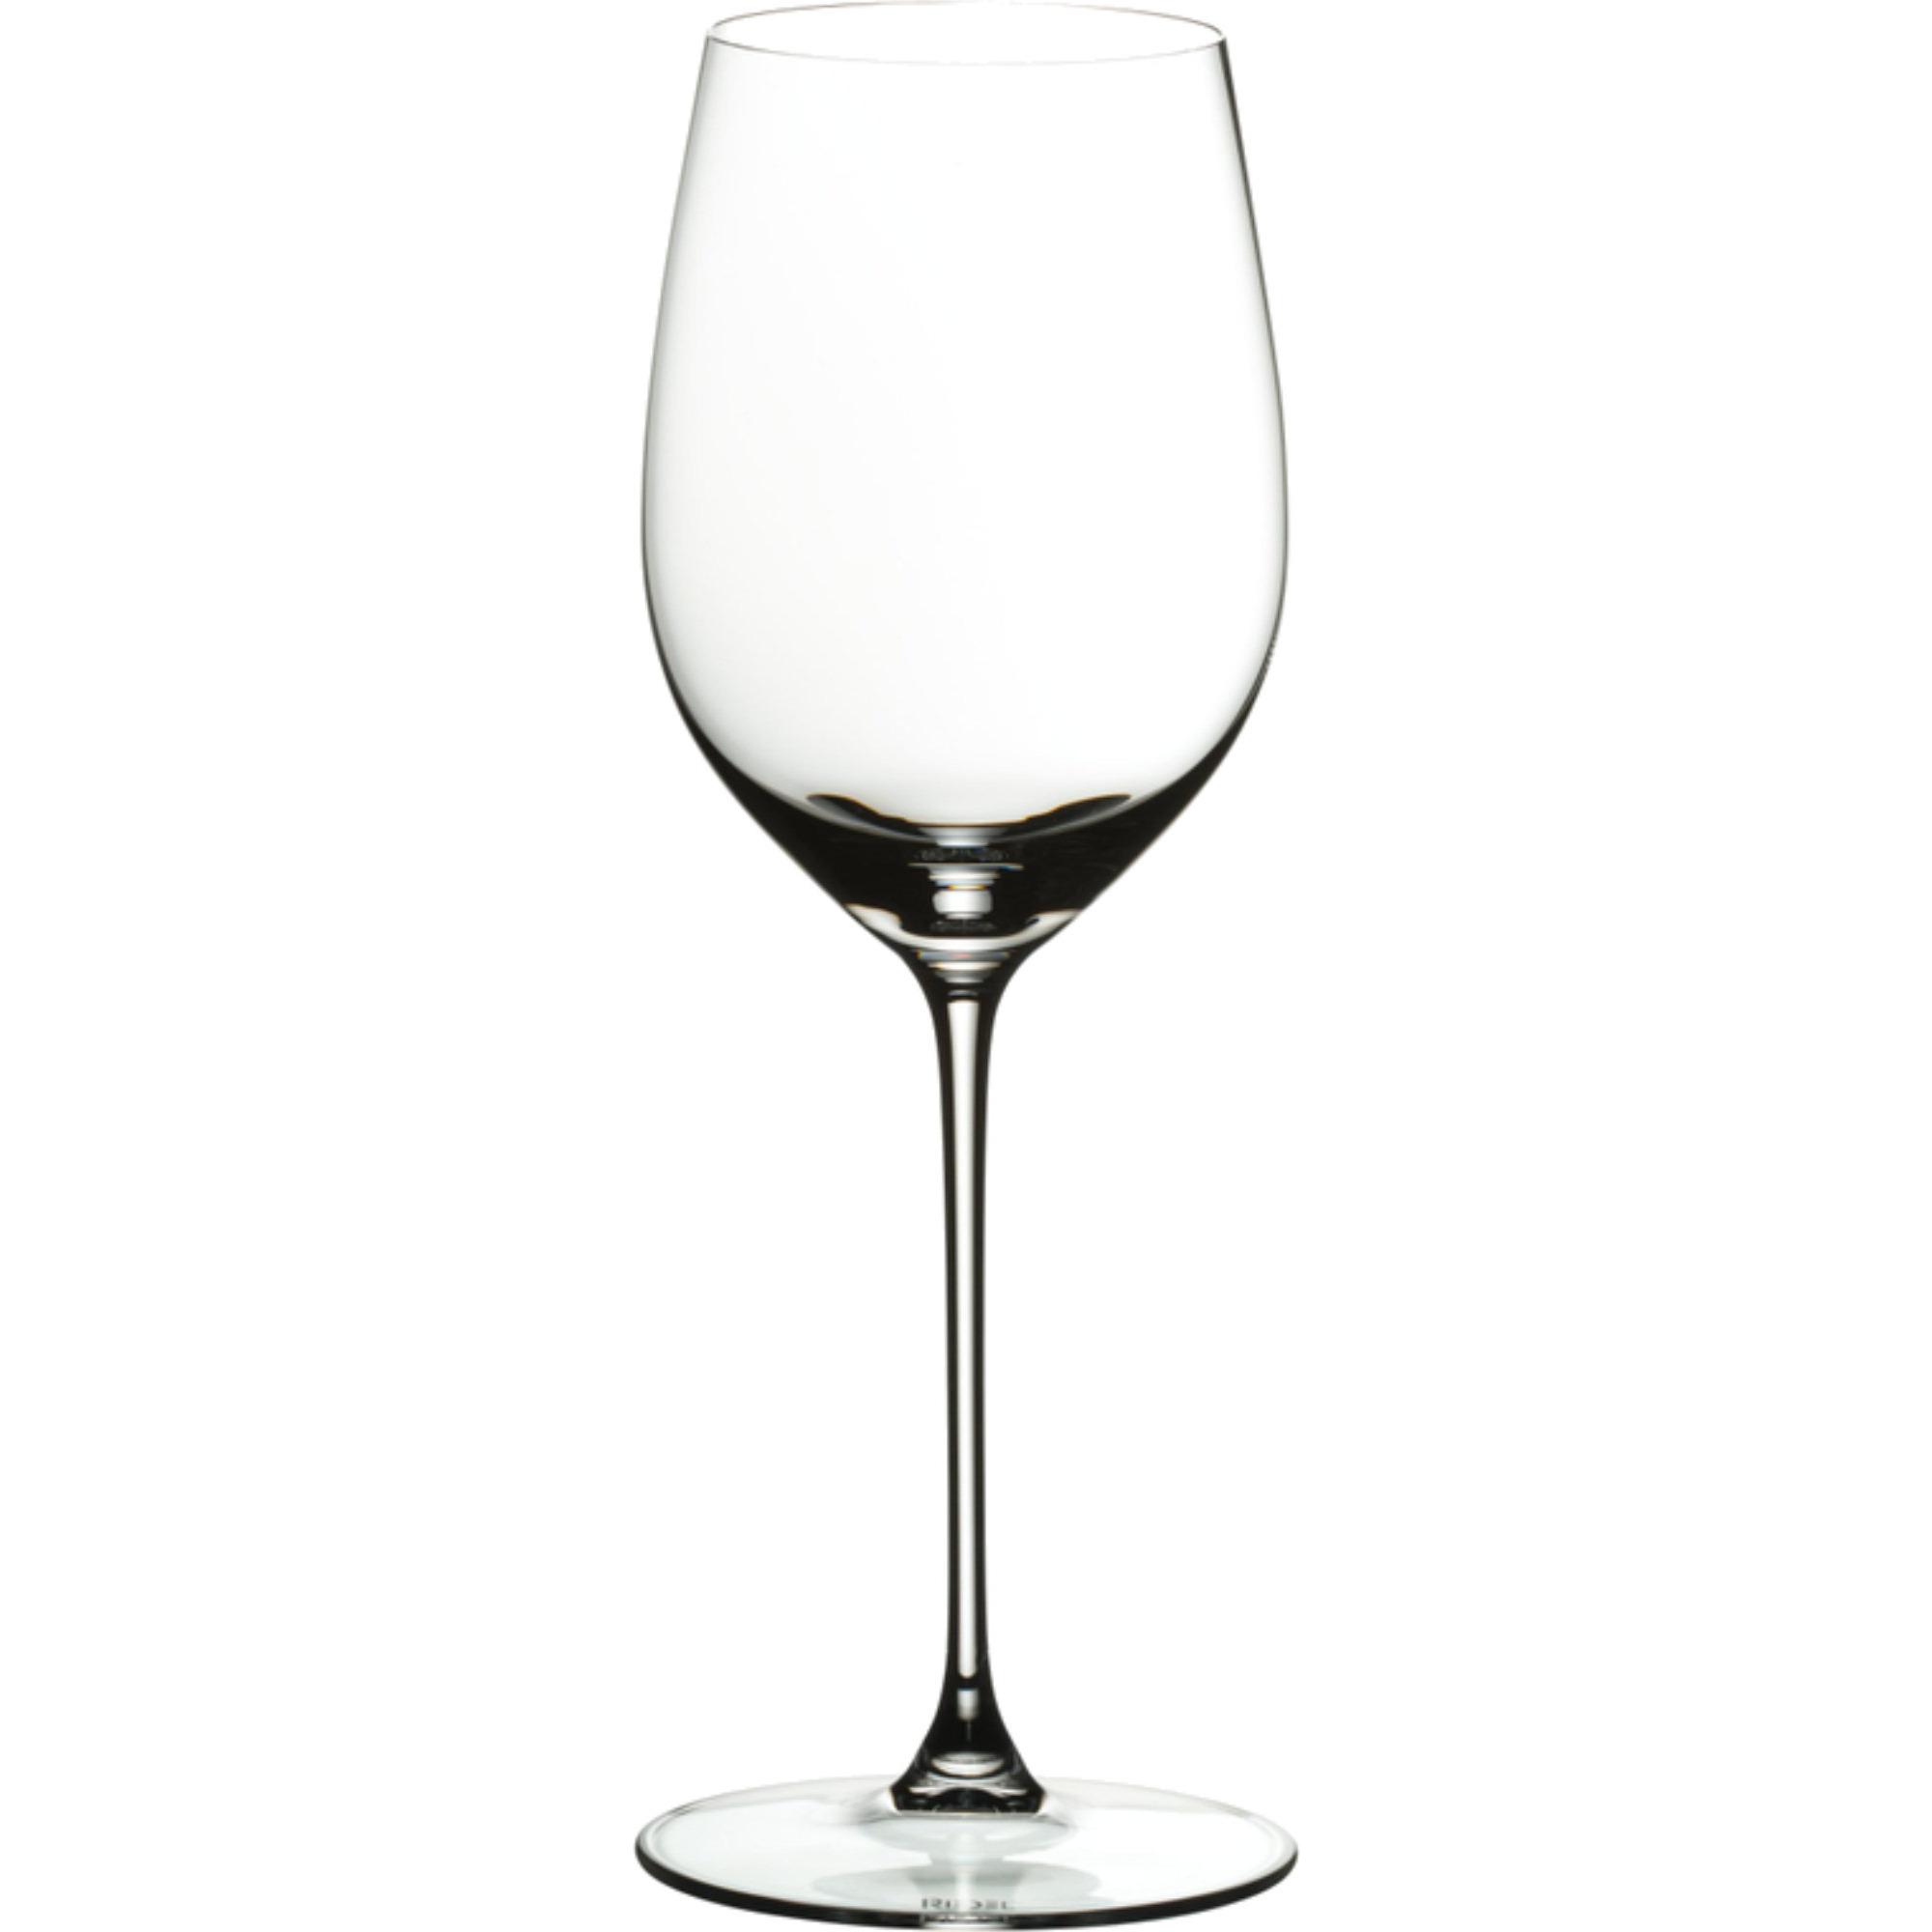 Riedel Veritas Viognier/Chardonnay Vinglas 37 cl2-pack